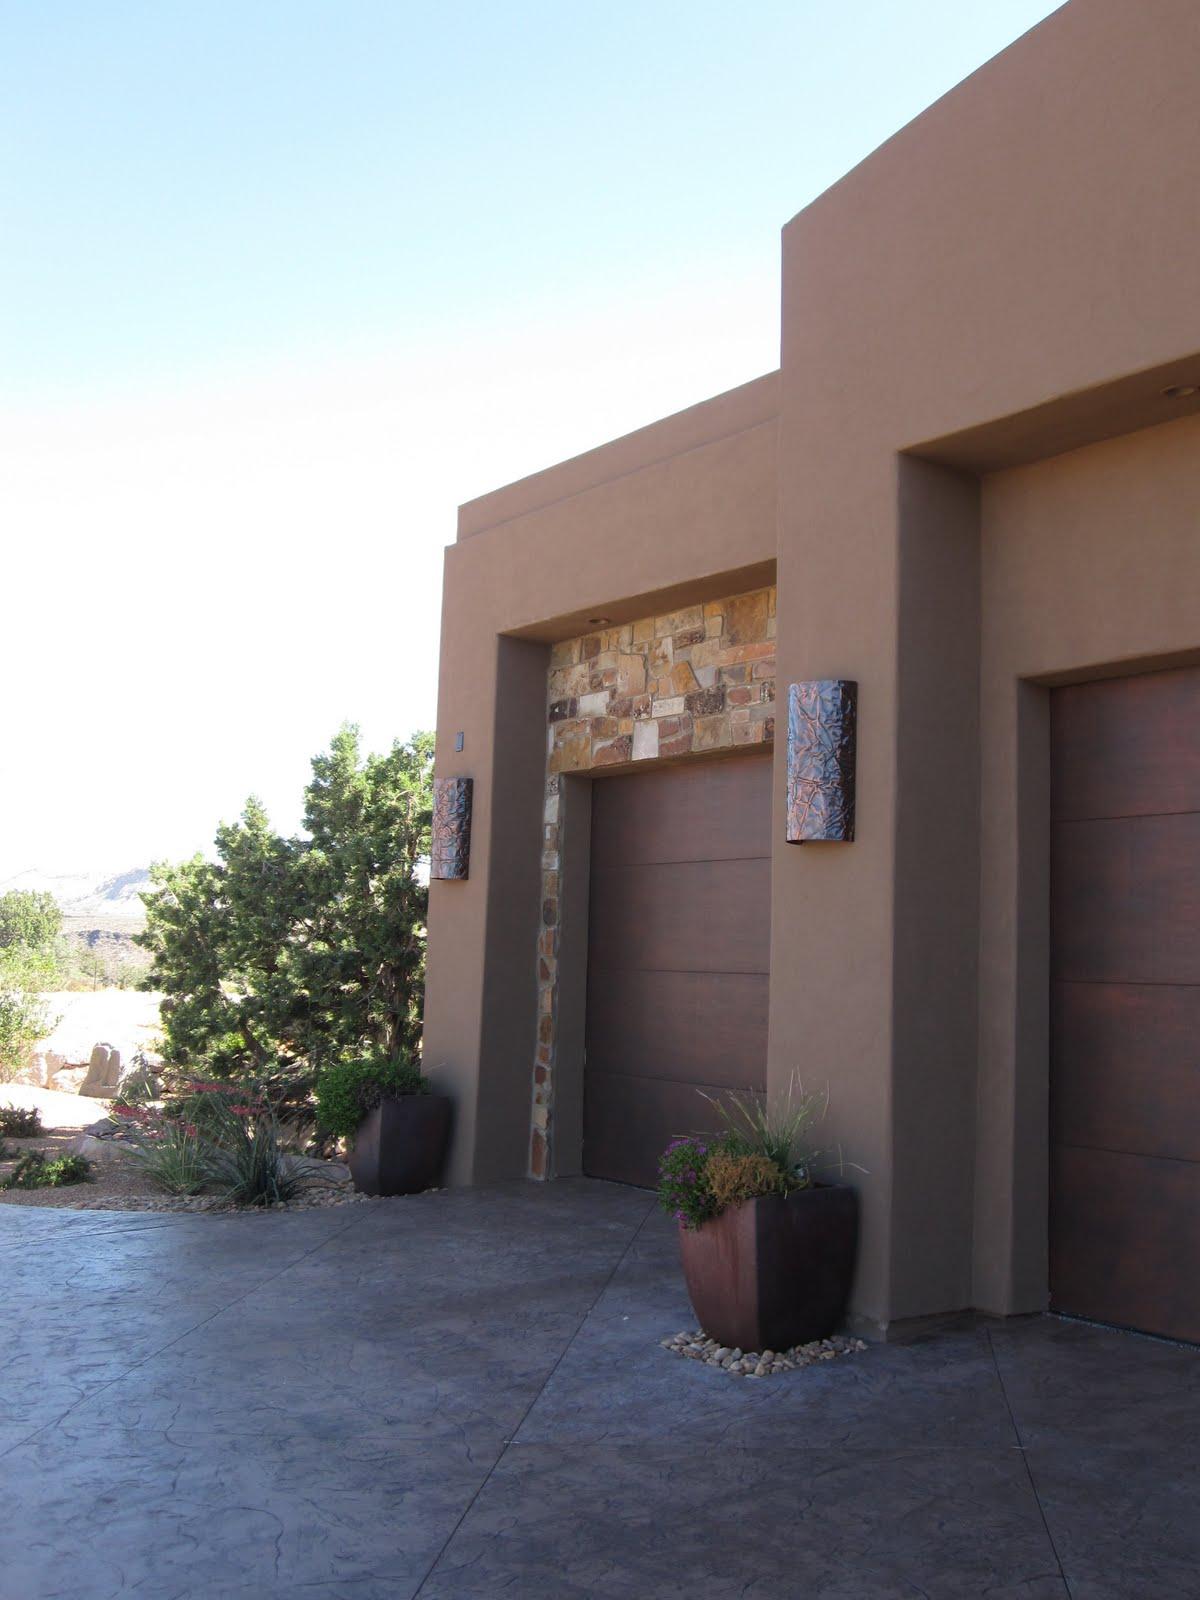 1600 #1990B2 BIG TIME House Lover : Garage Doors And Gates  St. George Utah wallpaper Utah Garage Doors 36851200